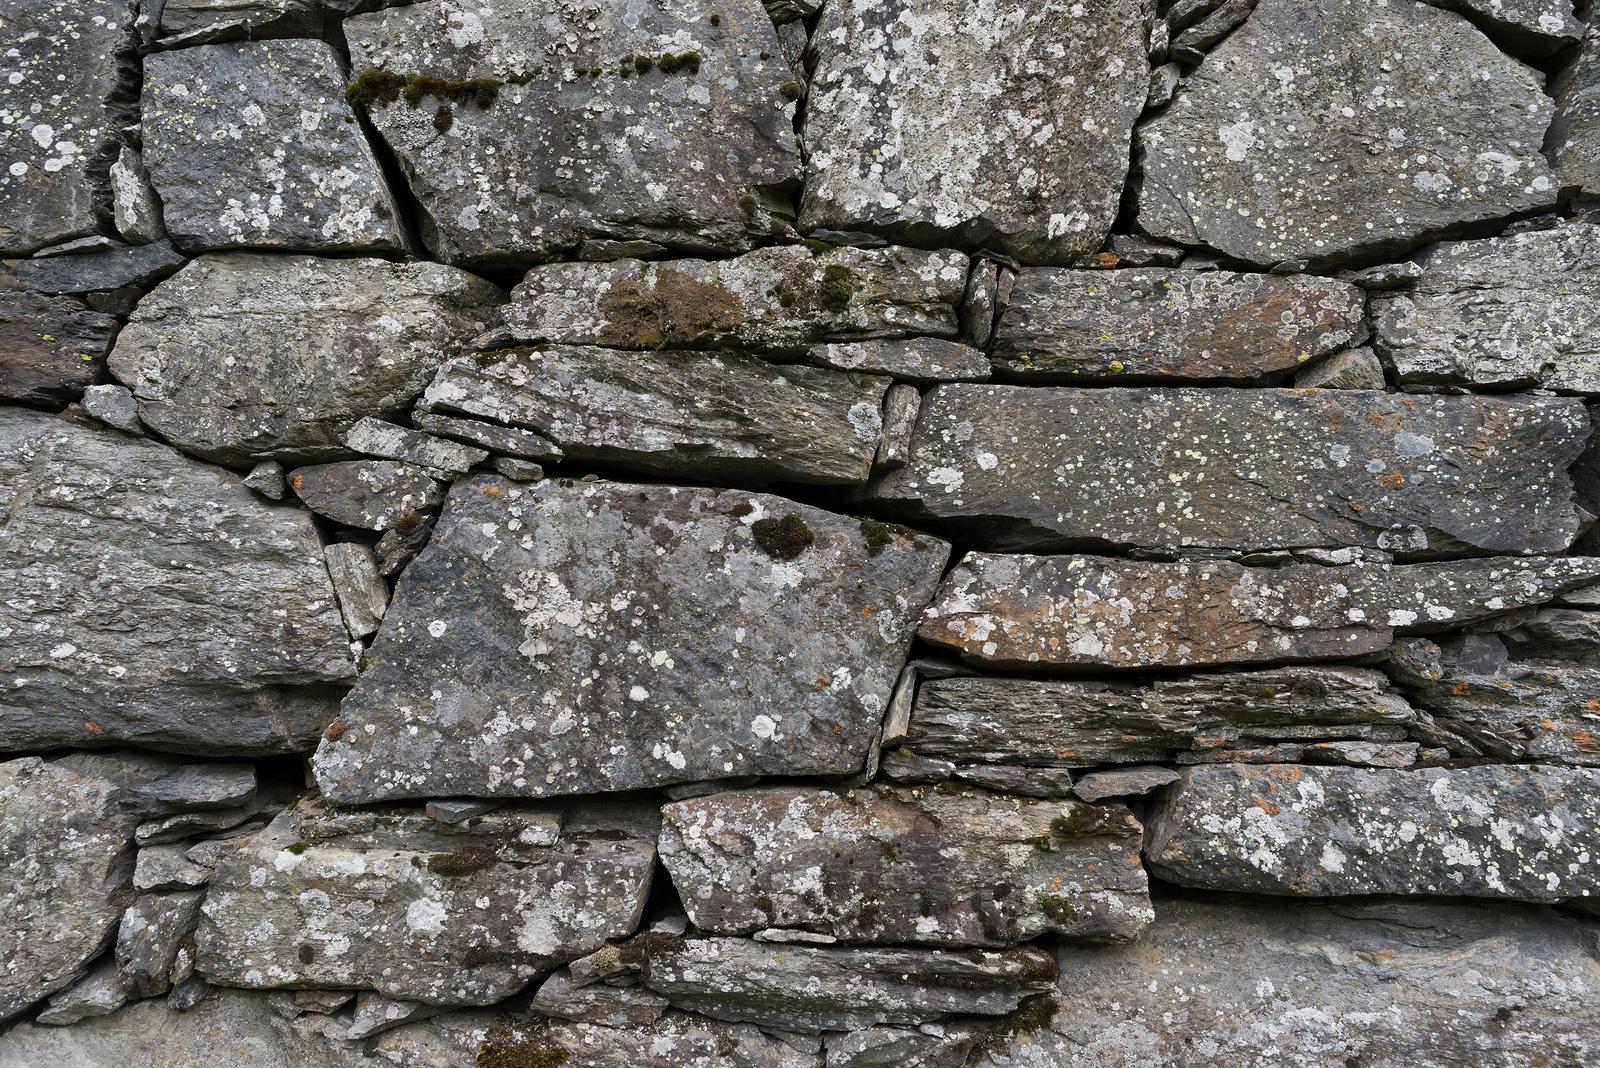 Old stone foundation. Texture of masonry